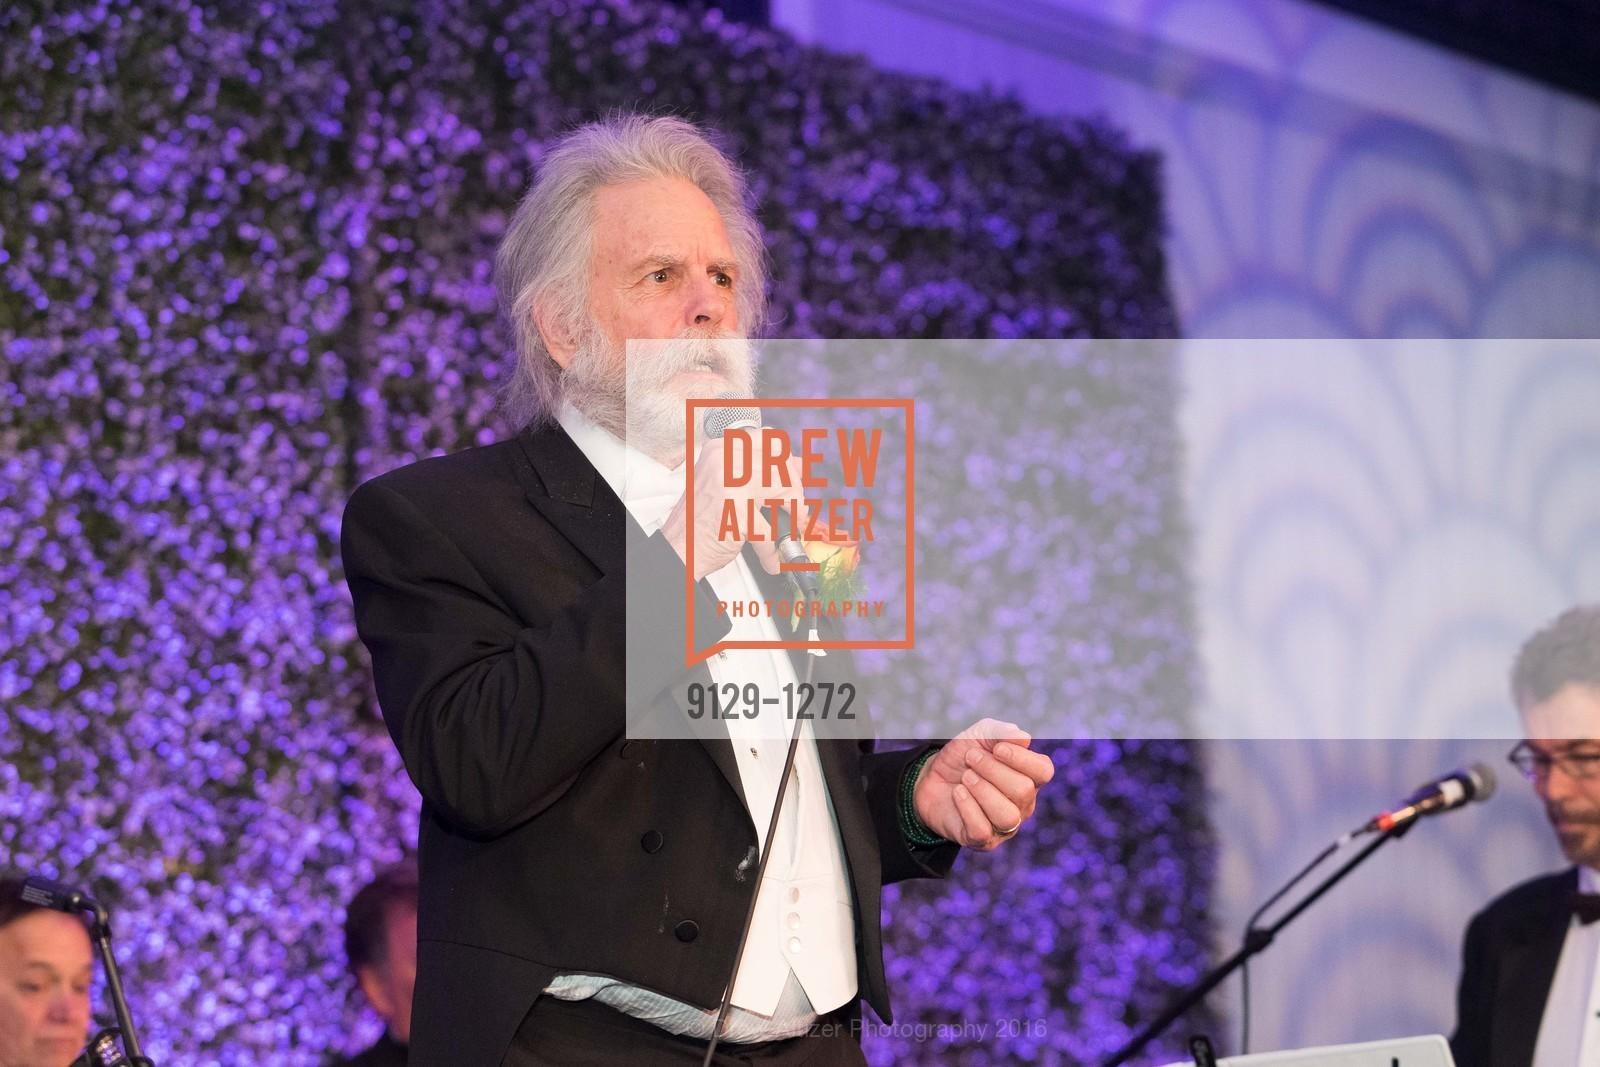 Bob Weir, Photo #9129-1272